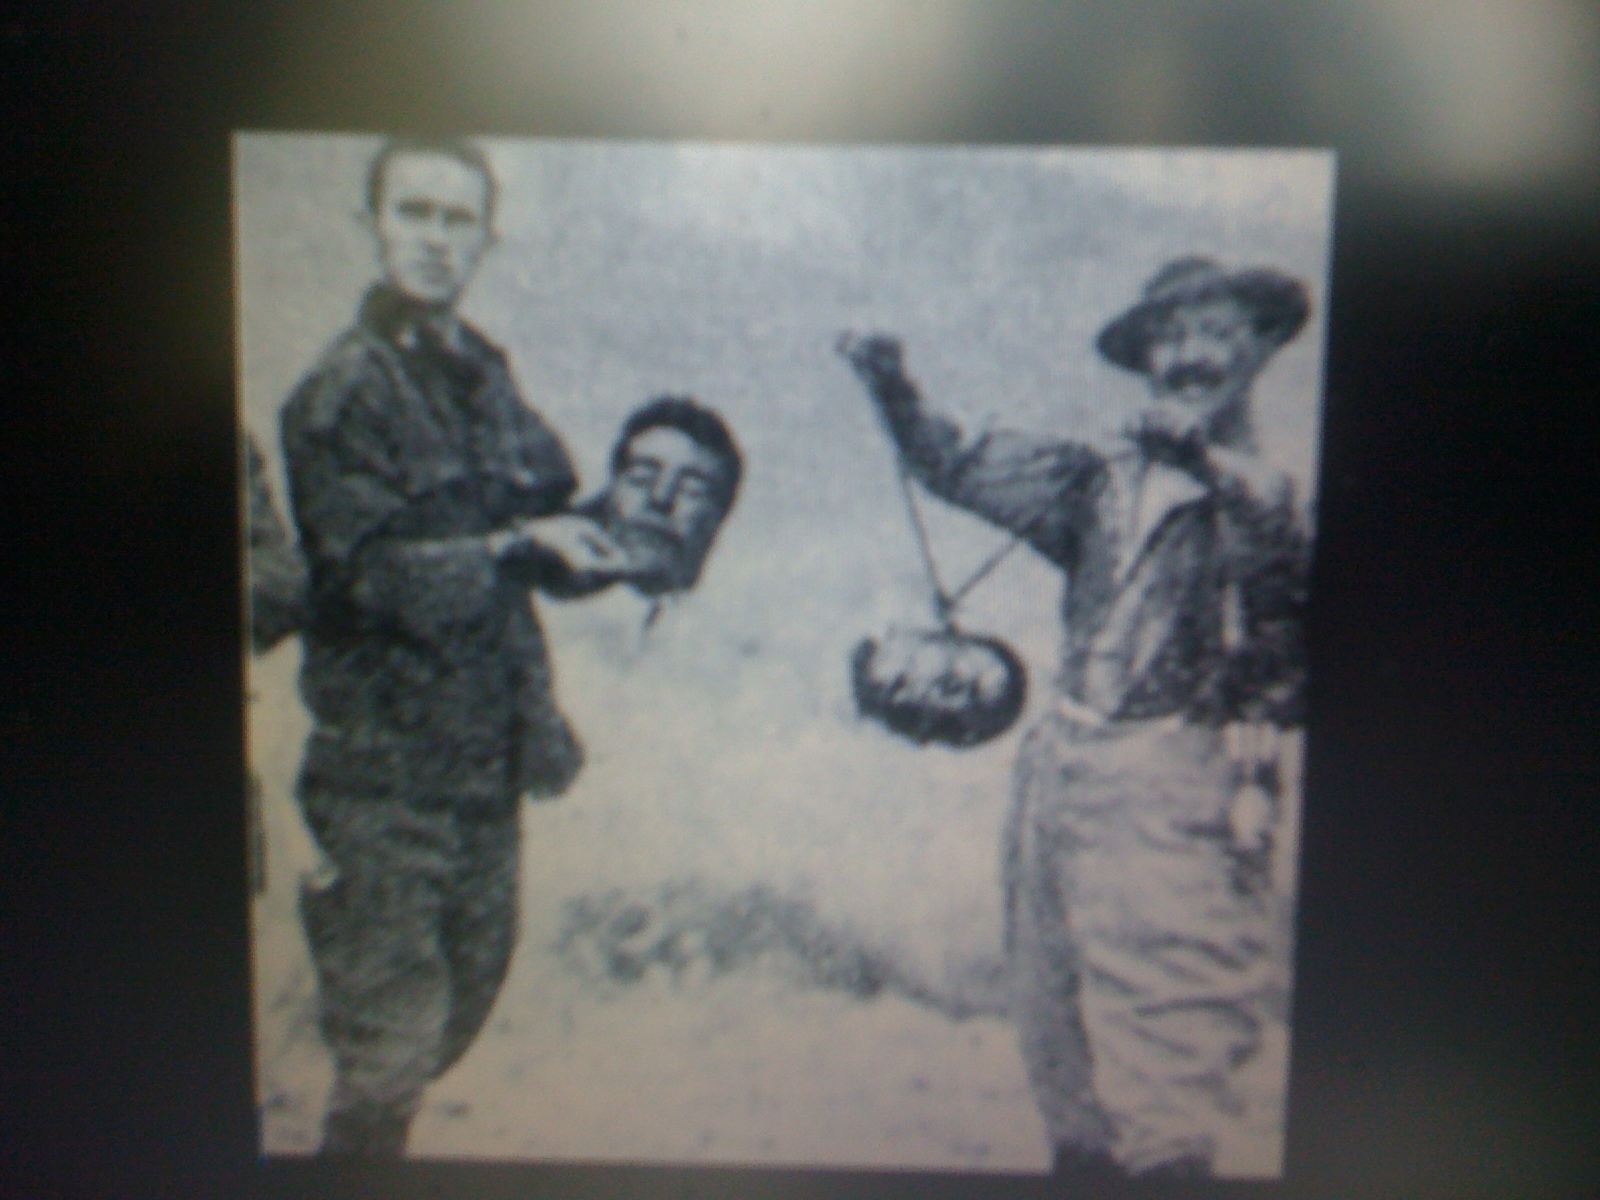 THE BLACK SOCIAL HISTORY PEOPLE IN ALGERIA